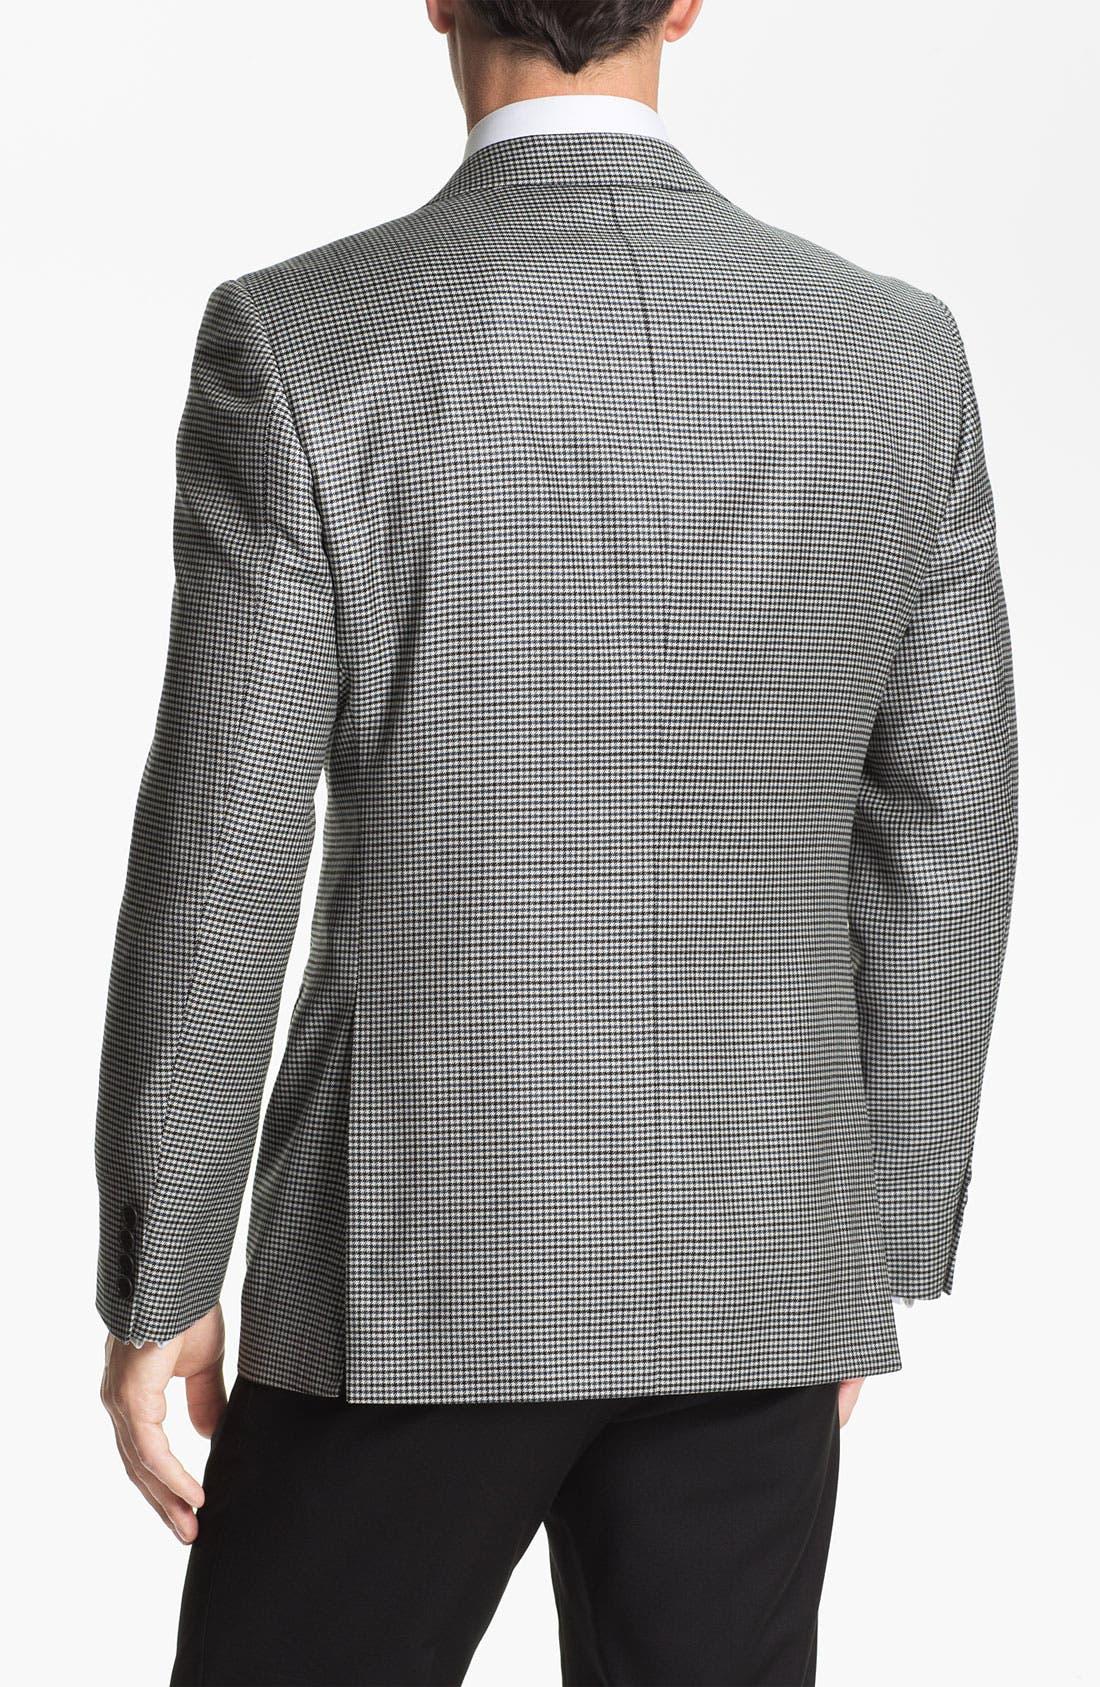 Alternate Image 2  - Joseph Abboud Check Sportcoat